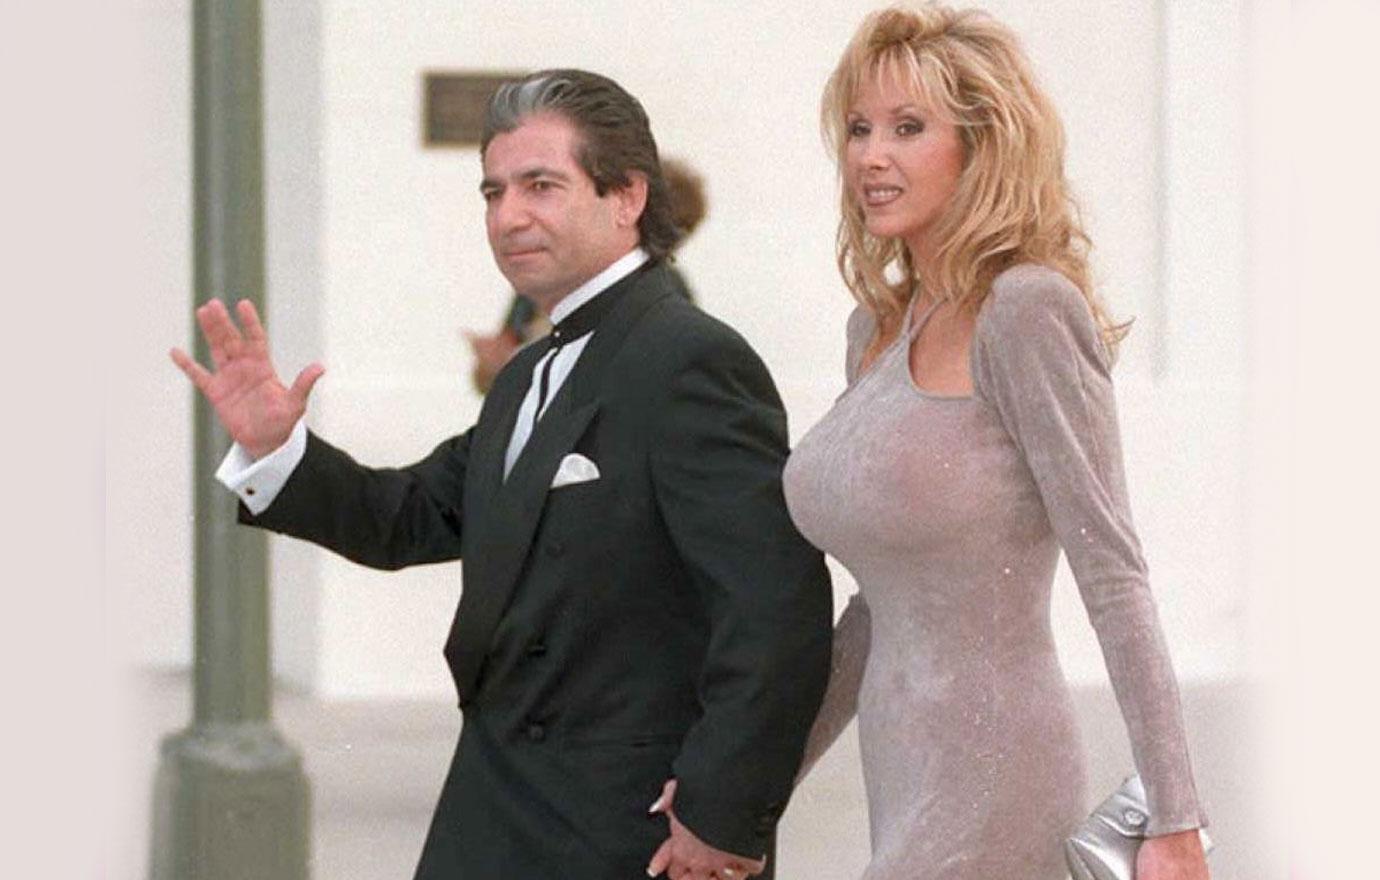 robert kardashian engaged denice halicki third cousin incest